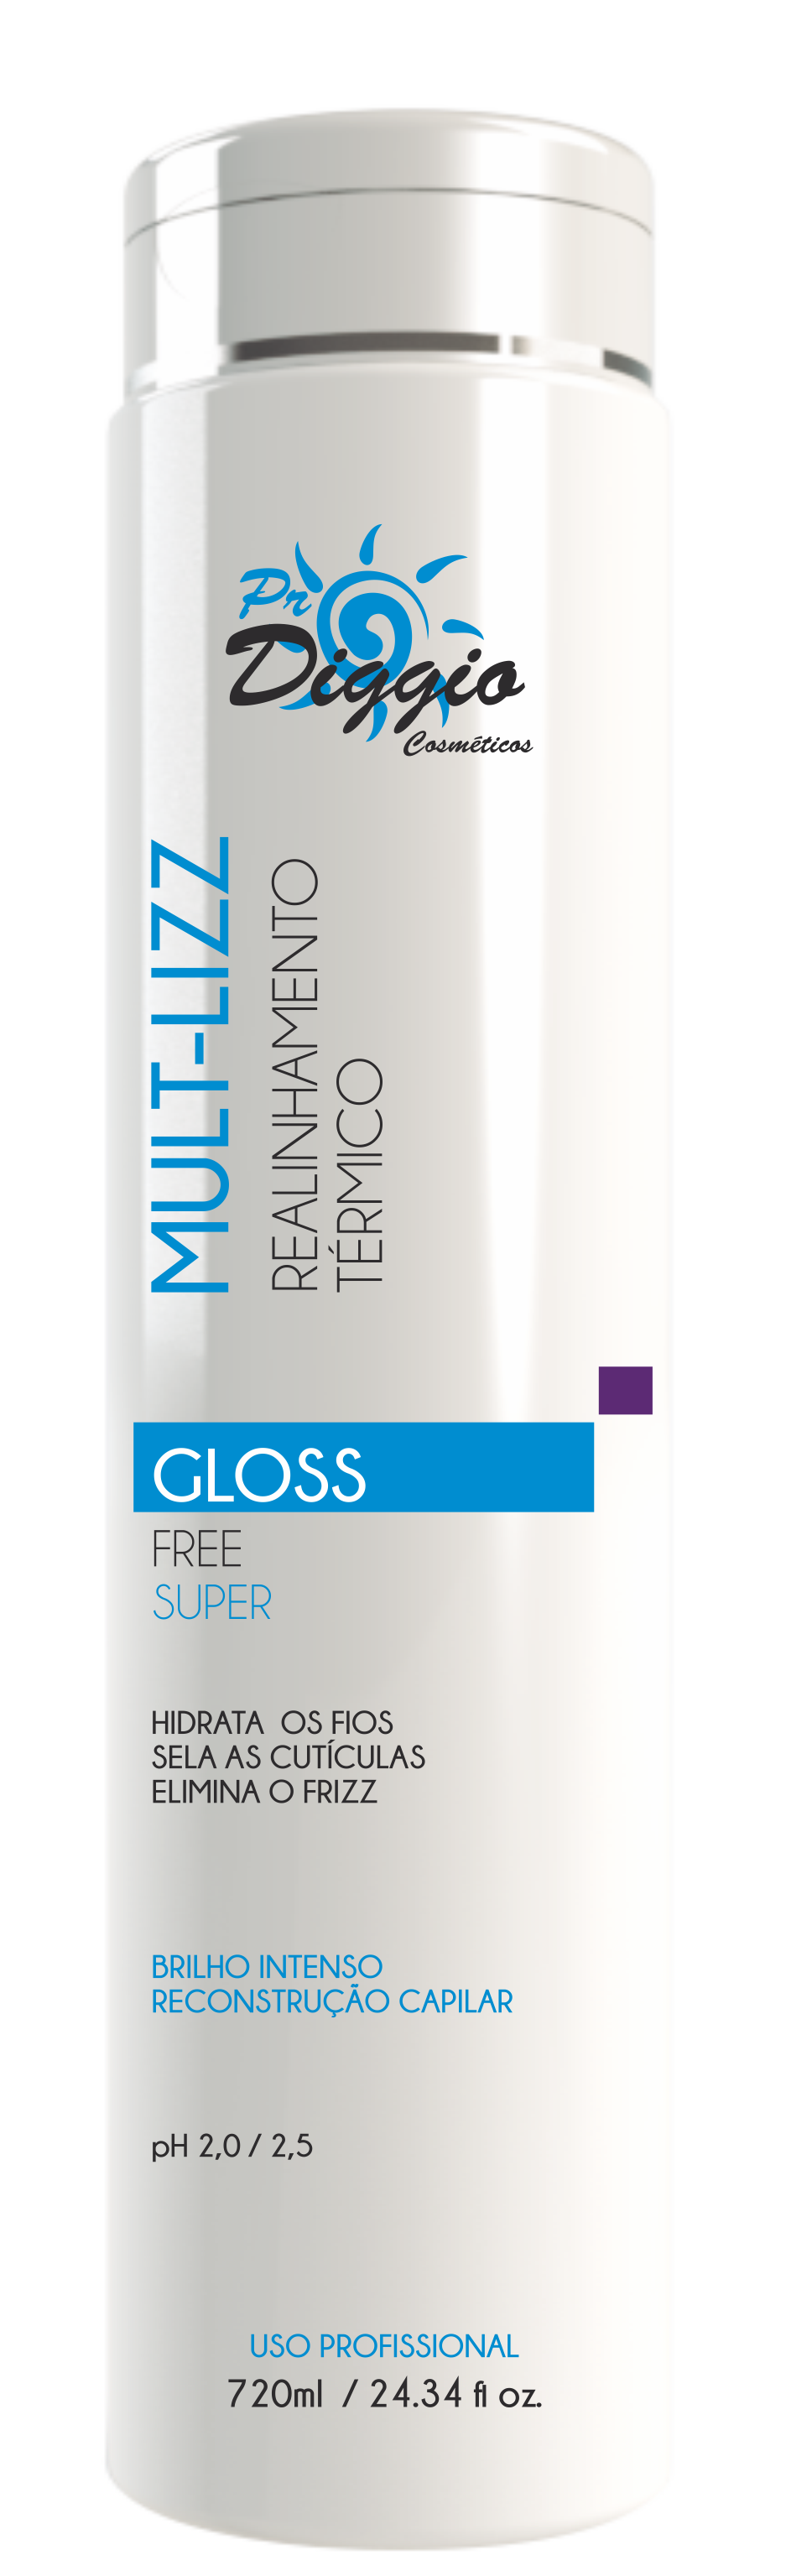 Gloss Free Super